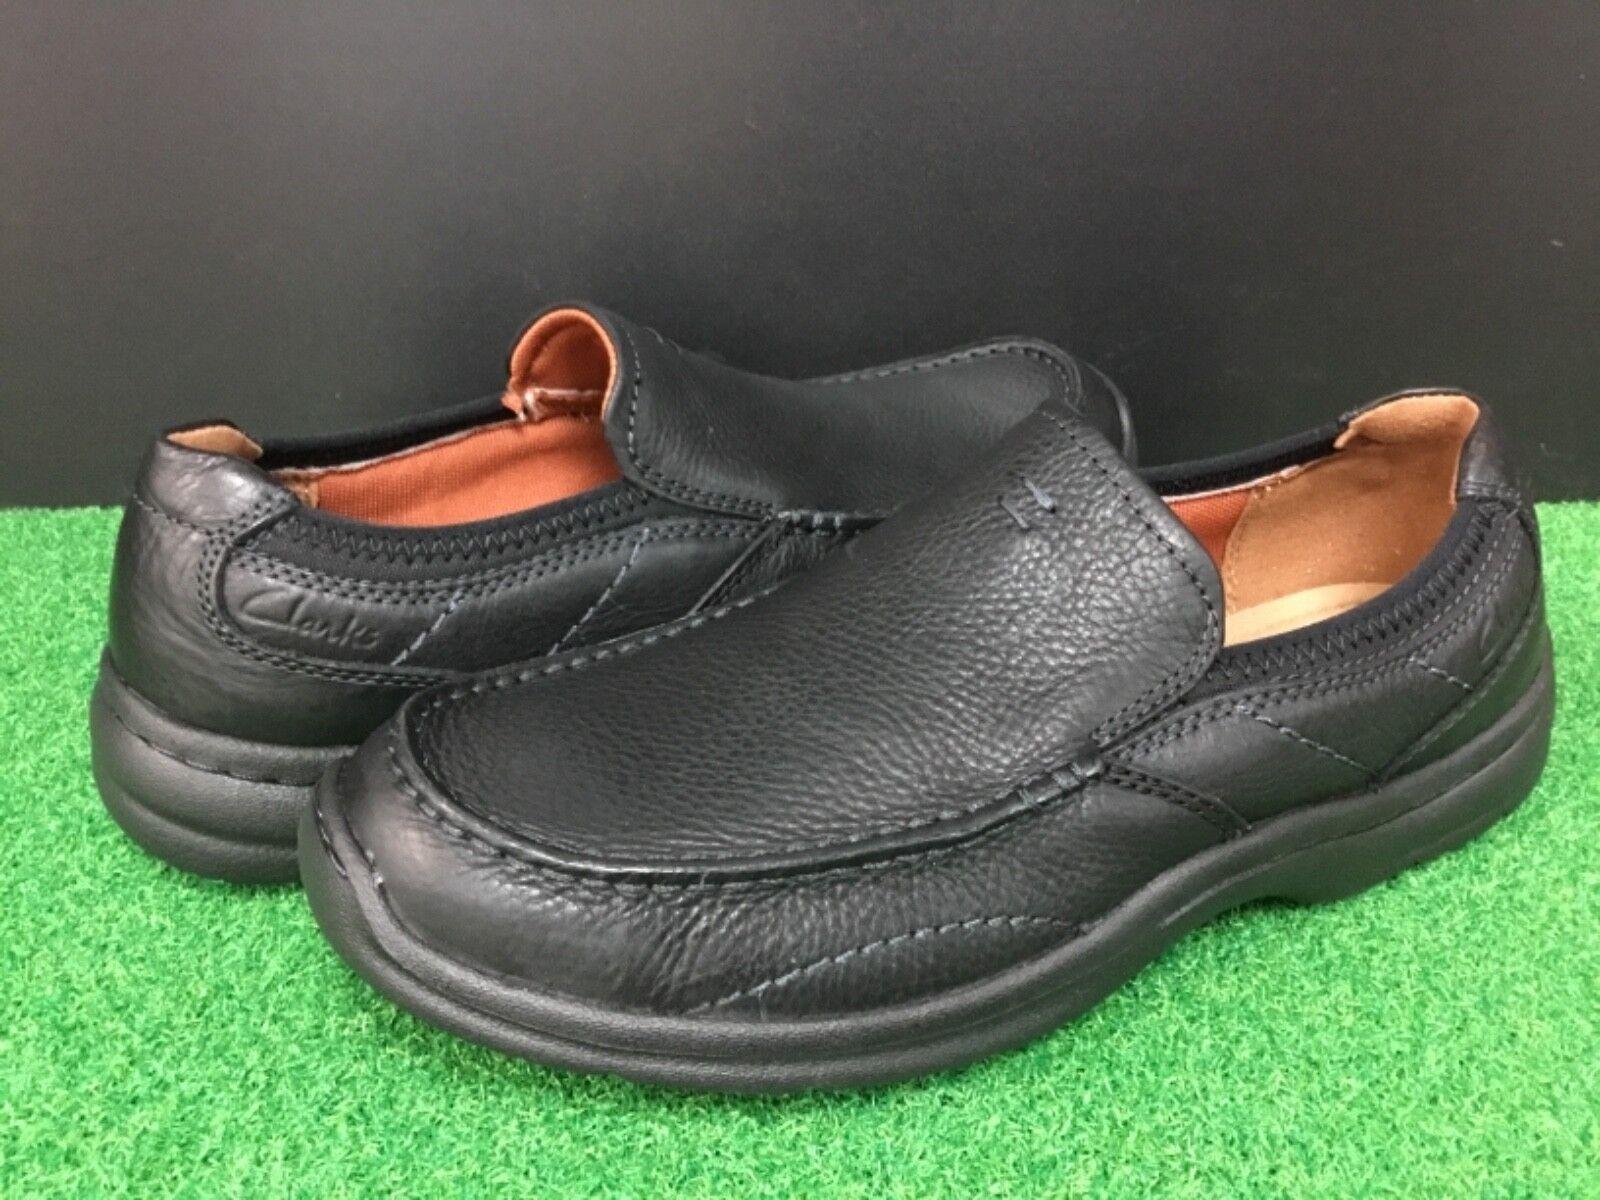 Scarpe casual da uomo  Clarks Niland Energy uomos Slip-on Lightweight Shoes NIB I